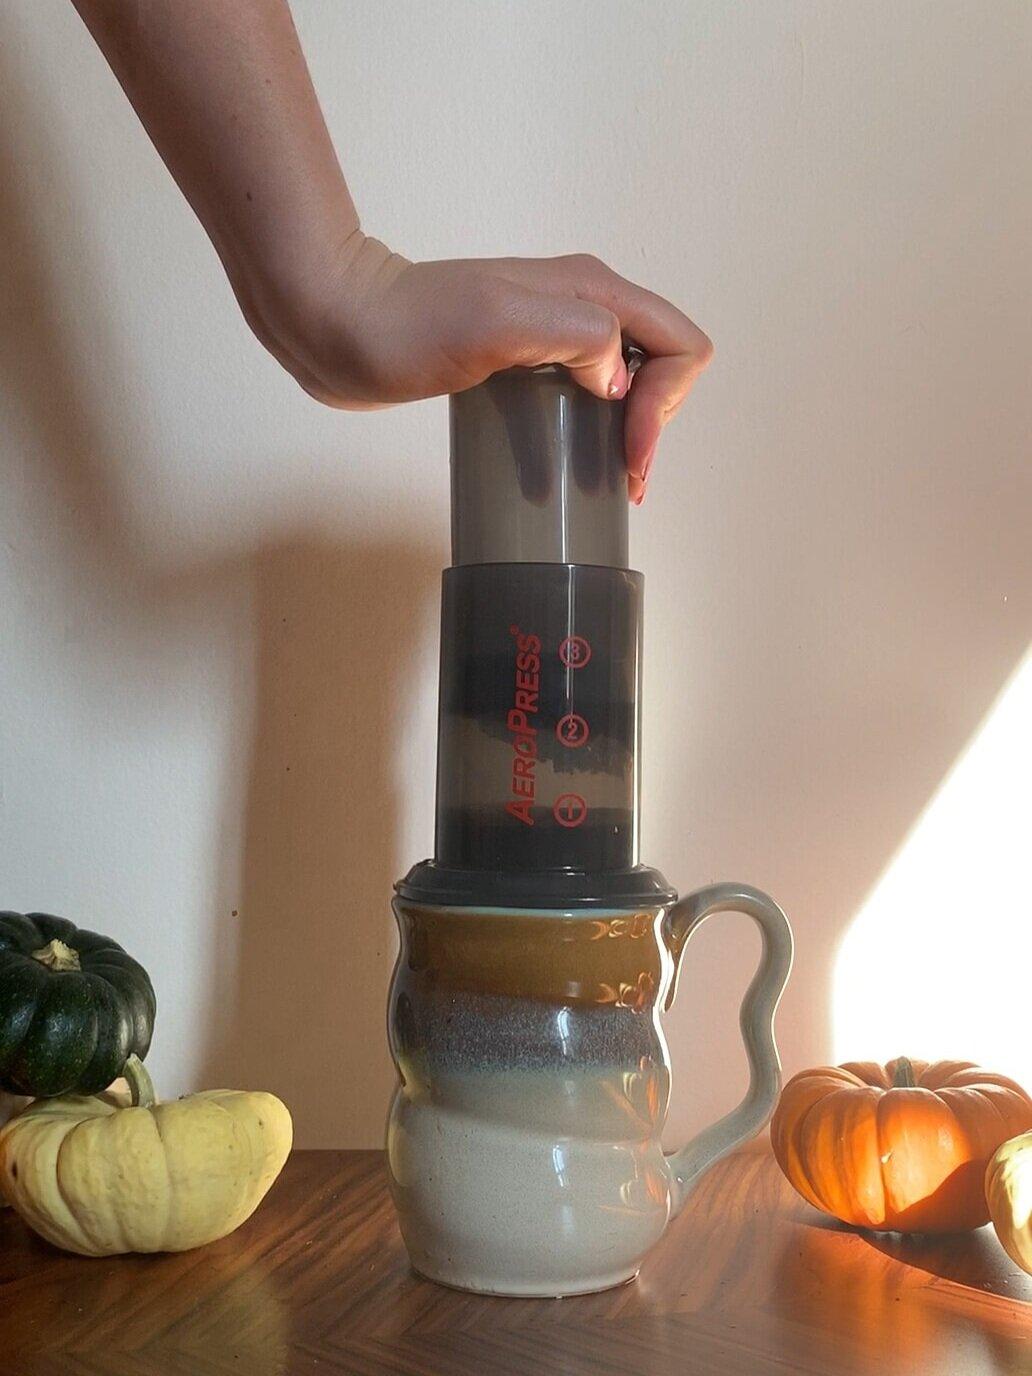 add+coffee+using+aeropress+to+milk.jpg